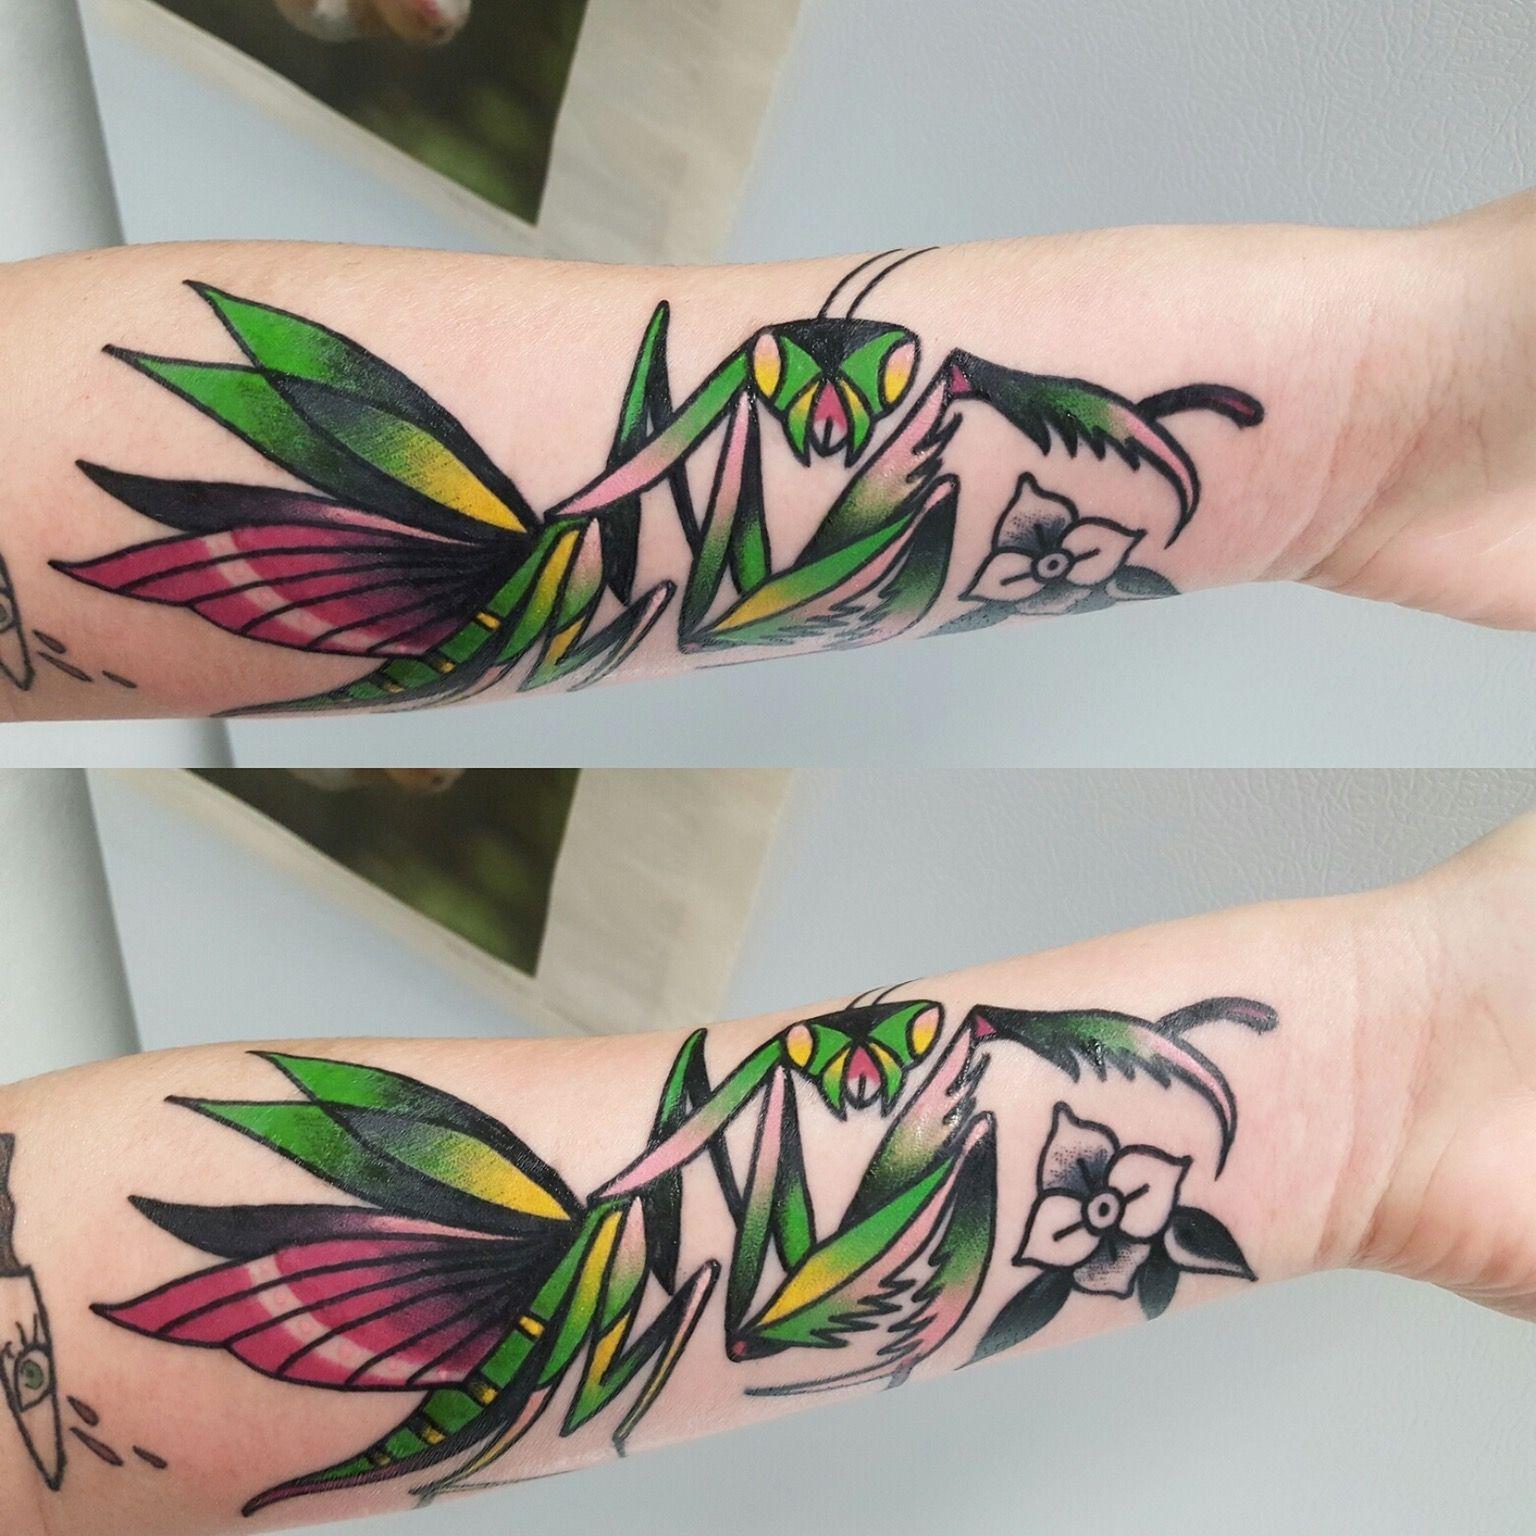 Praying Mantis Tattoo By Sean Williams At Amulet Tattoos In St